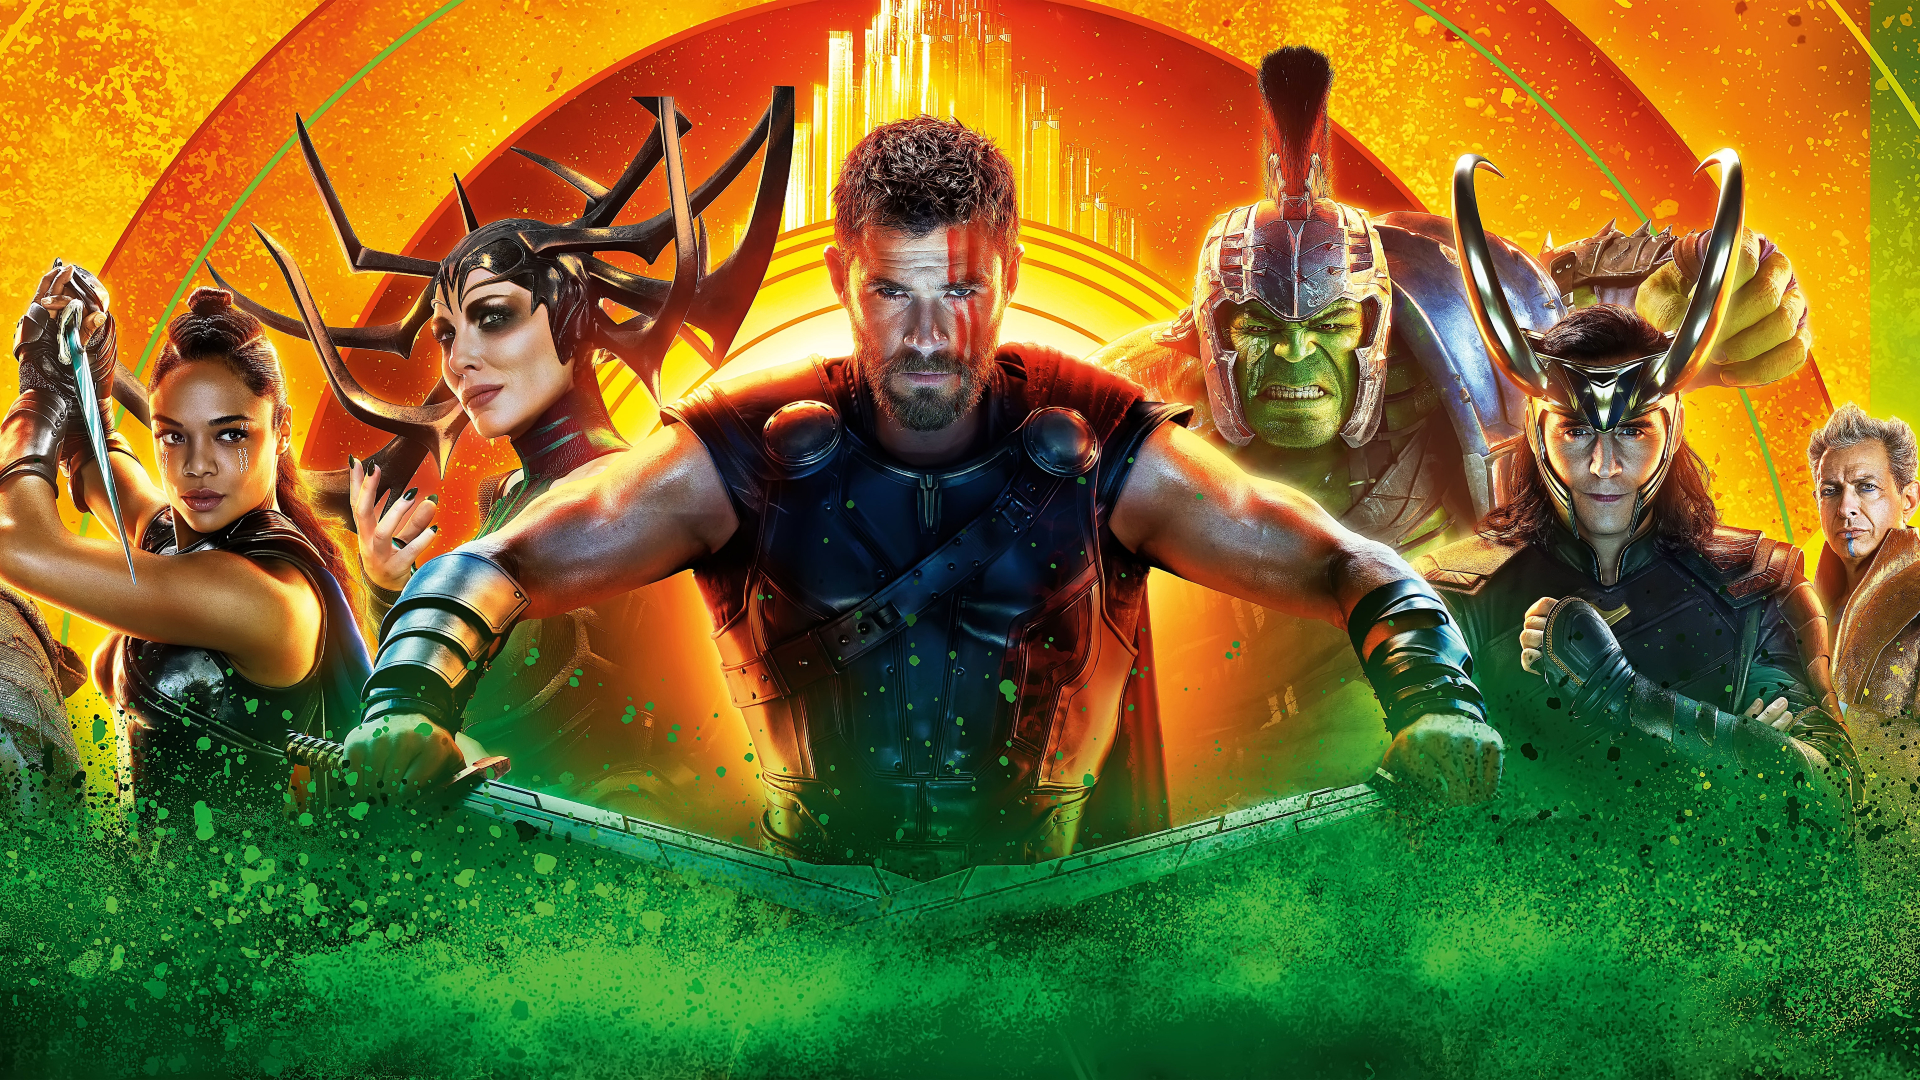 1920x1080 Thor Ragnarok 2017 Movie 2017 1080p Laptop Full Hd